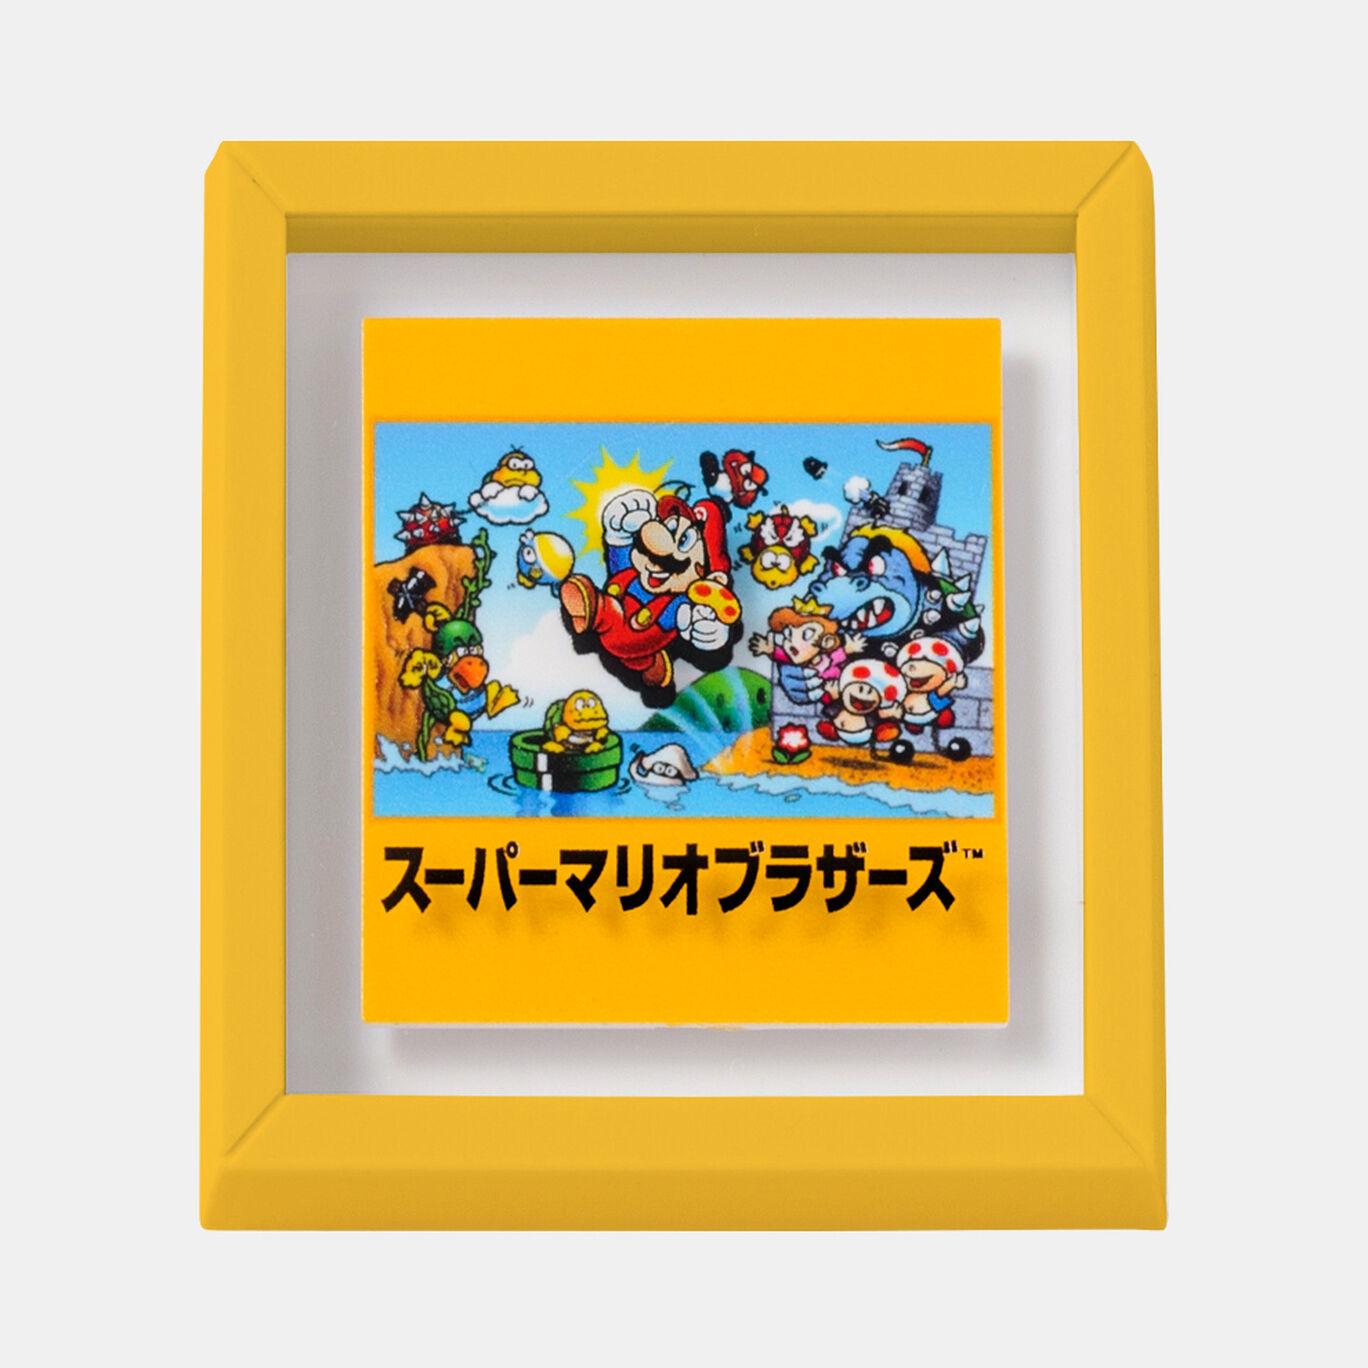 【BOX商品】マグネットコレクション スーパーマリオ【Nintendo TOKYO取り扱い商品】